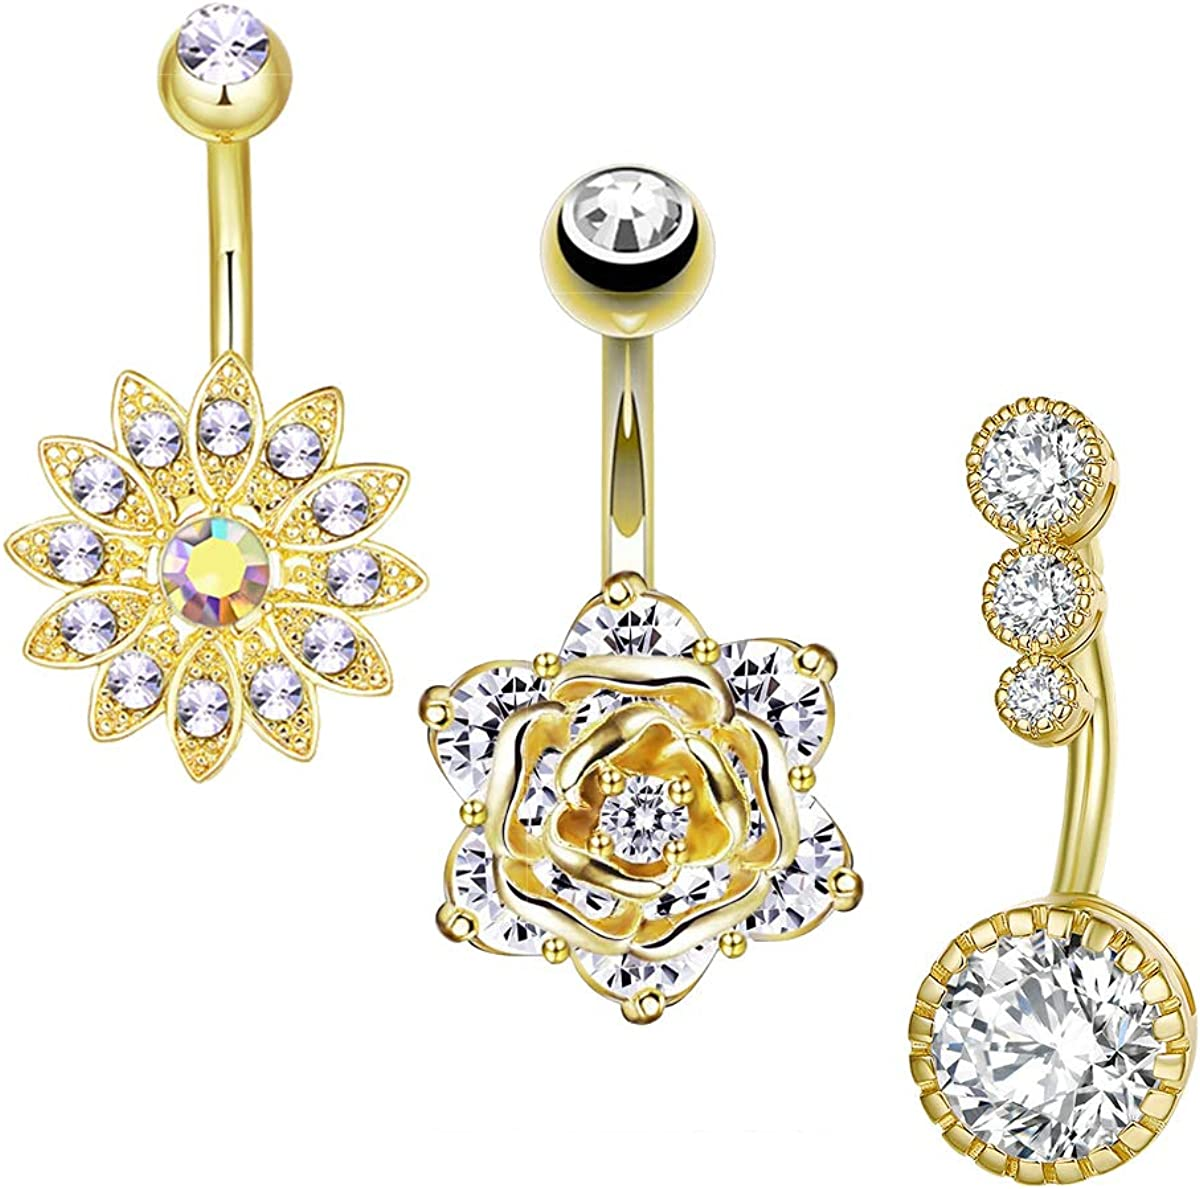 CEYIYA CZ Flower Belly Button Rings - Surgical Steel Vibrant Rhinestone Rose Flower Navel Rings 18k Gold - Diamond Short Belly Piercing Jewelry Pack of 3